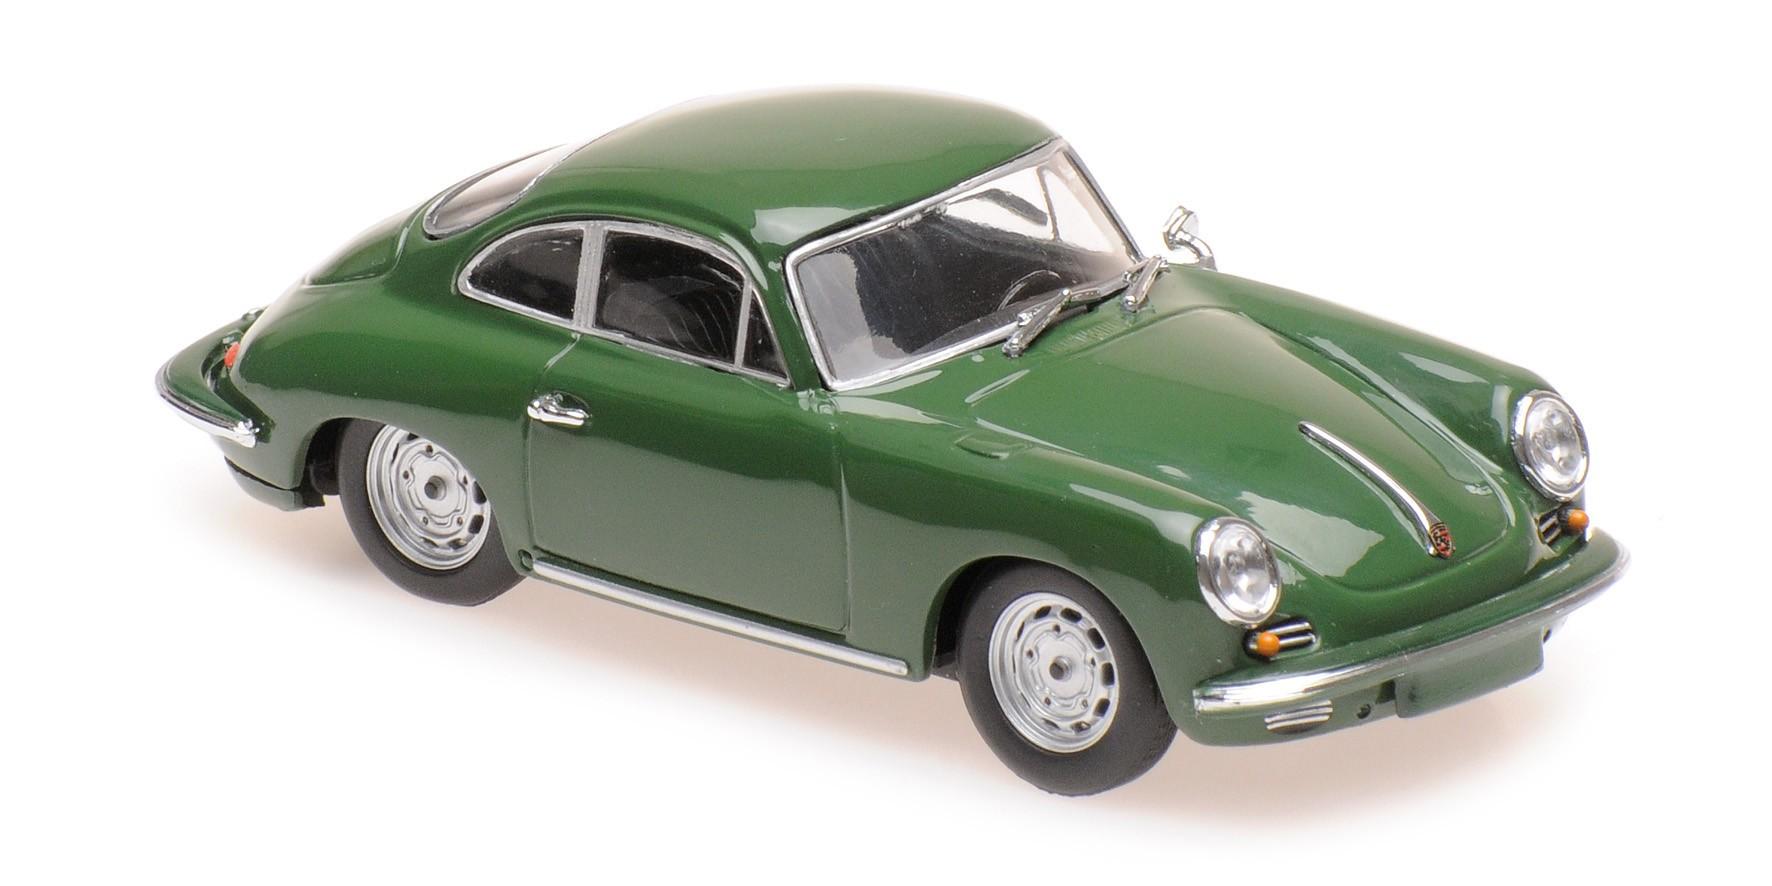 Porsche 356 C carrera 2 Coupe 1963 verde oscuro 1:43 Minichamps maxichamps